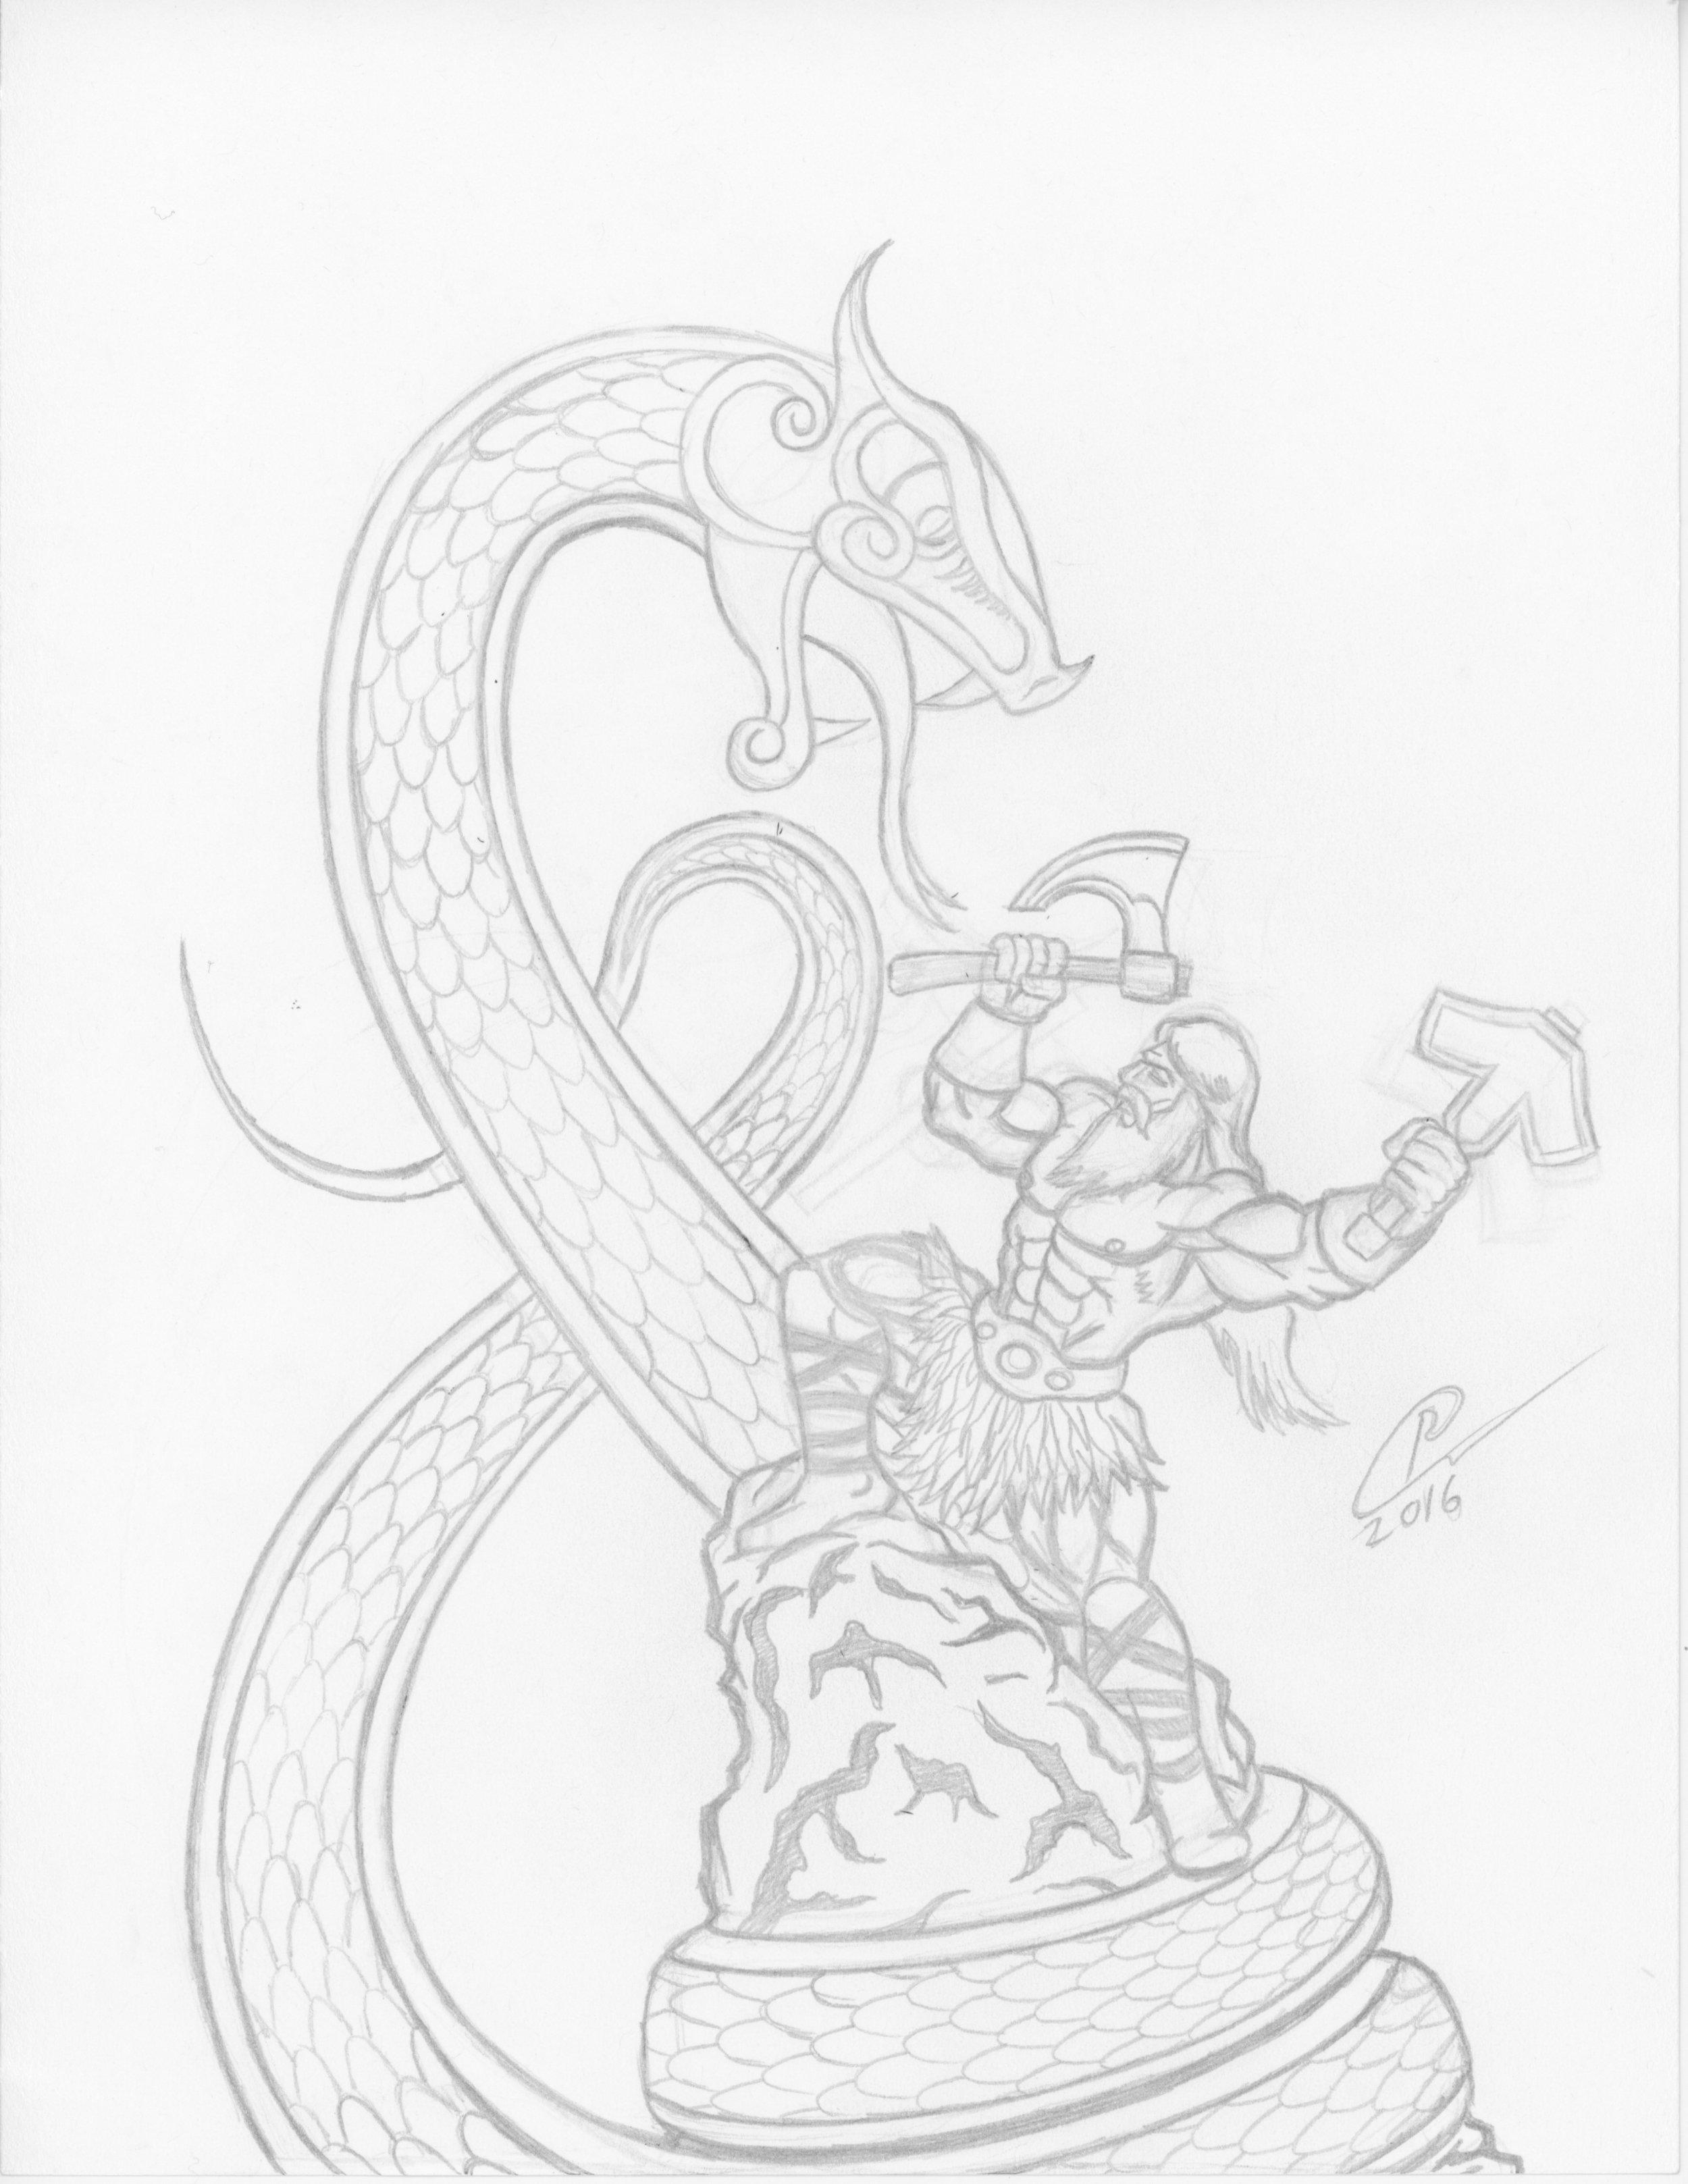 raskolapparel-raskol-apparel-thor-megin-nordic-norse-hero-mythos-mythology-epic-gym-gear-bodybuilding-shirt-power-gold-black-orozco-design-roberto-orozcodesign-artist-vector-thorhammer-sketch-illustration.jpg